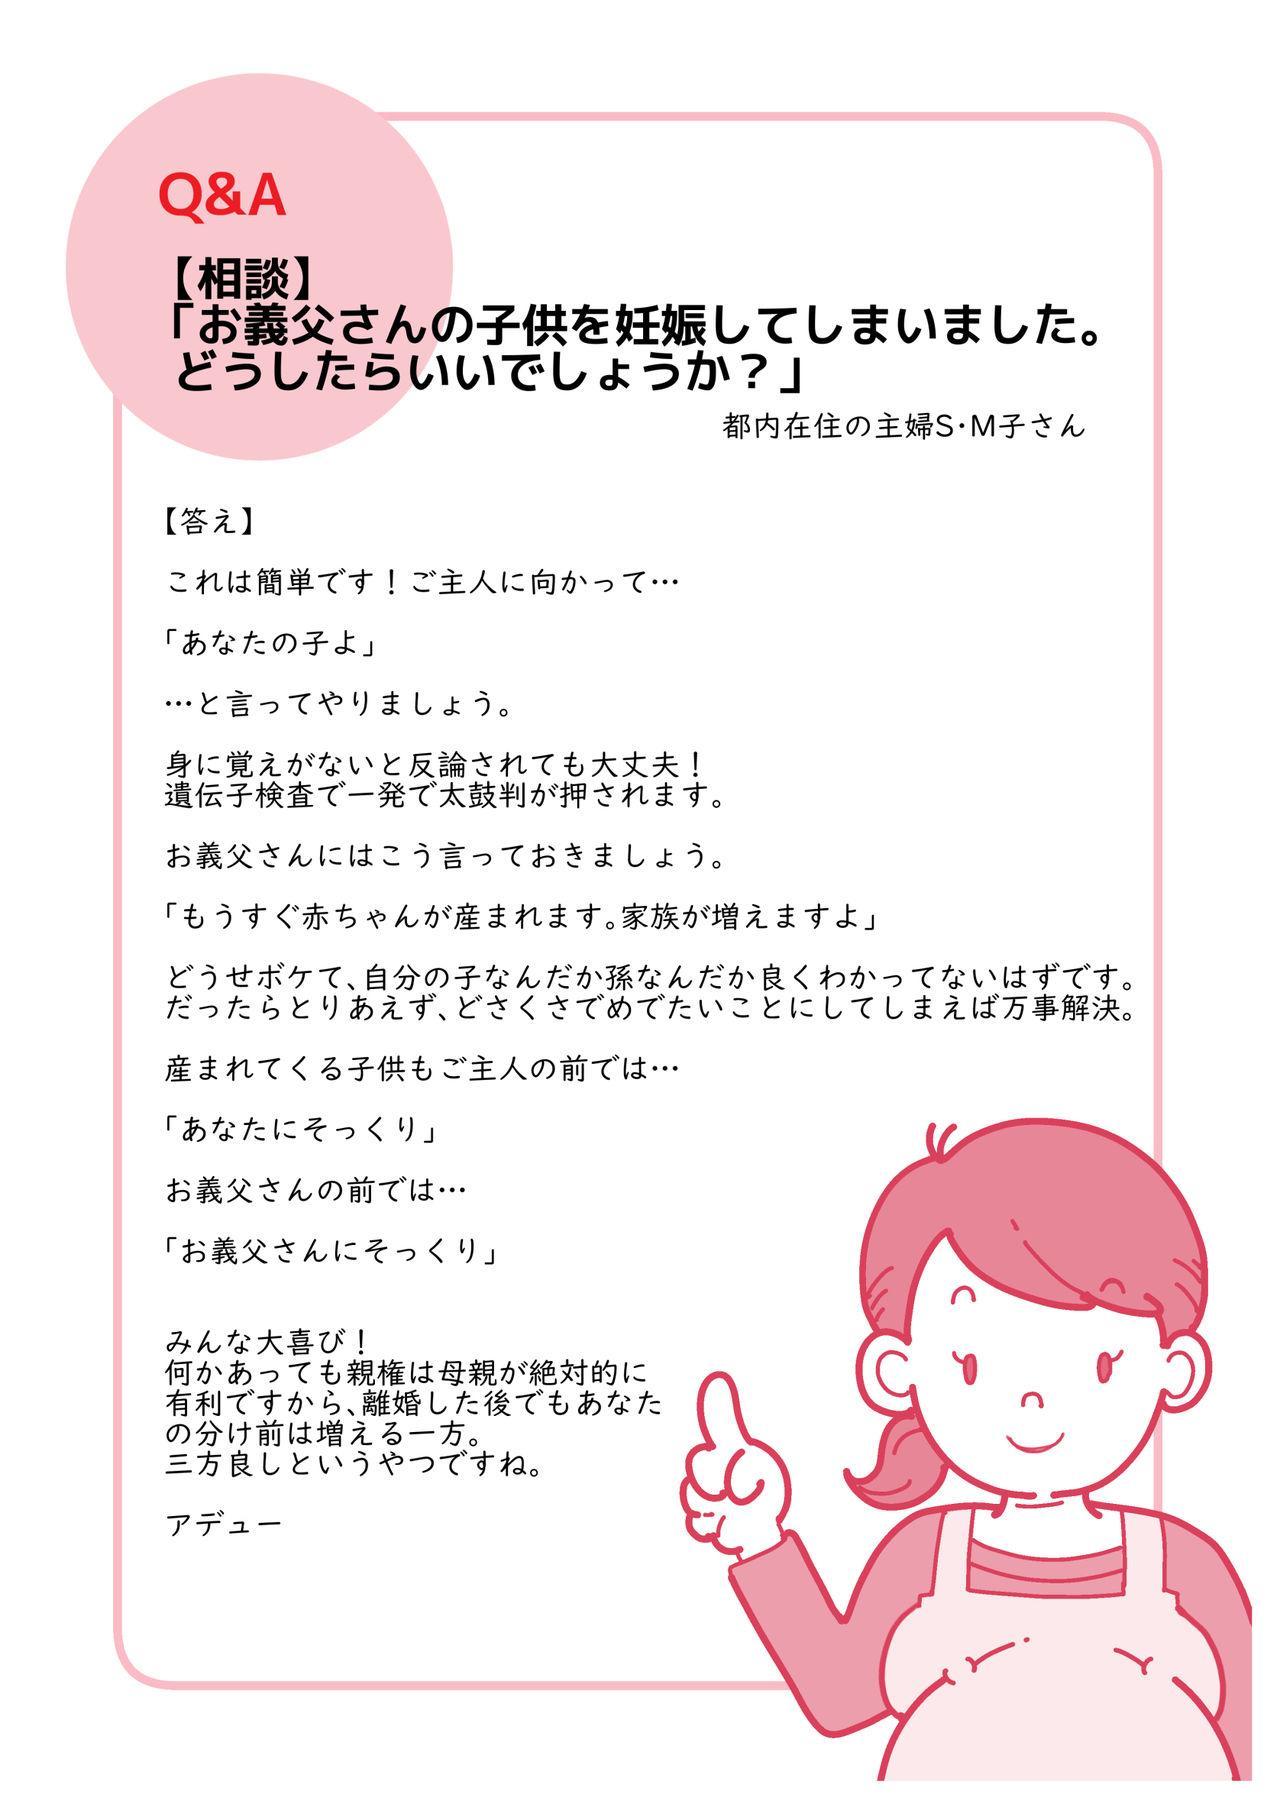 Isogasii Okaasan No Tamuno Sasa Rouzin Seikaigo | Guide for Elderly Sex Health Care to Busy Mom 65